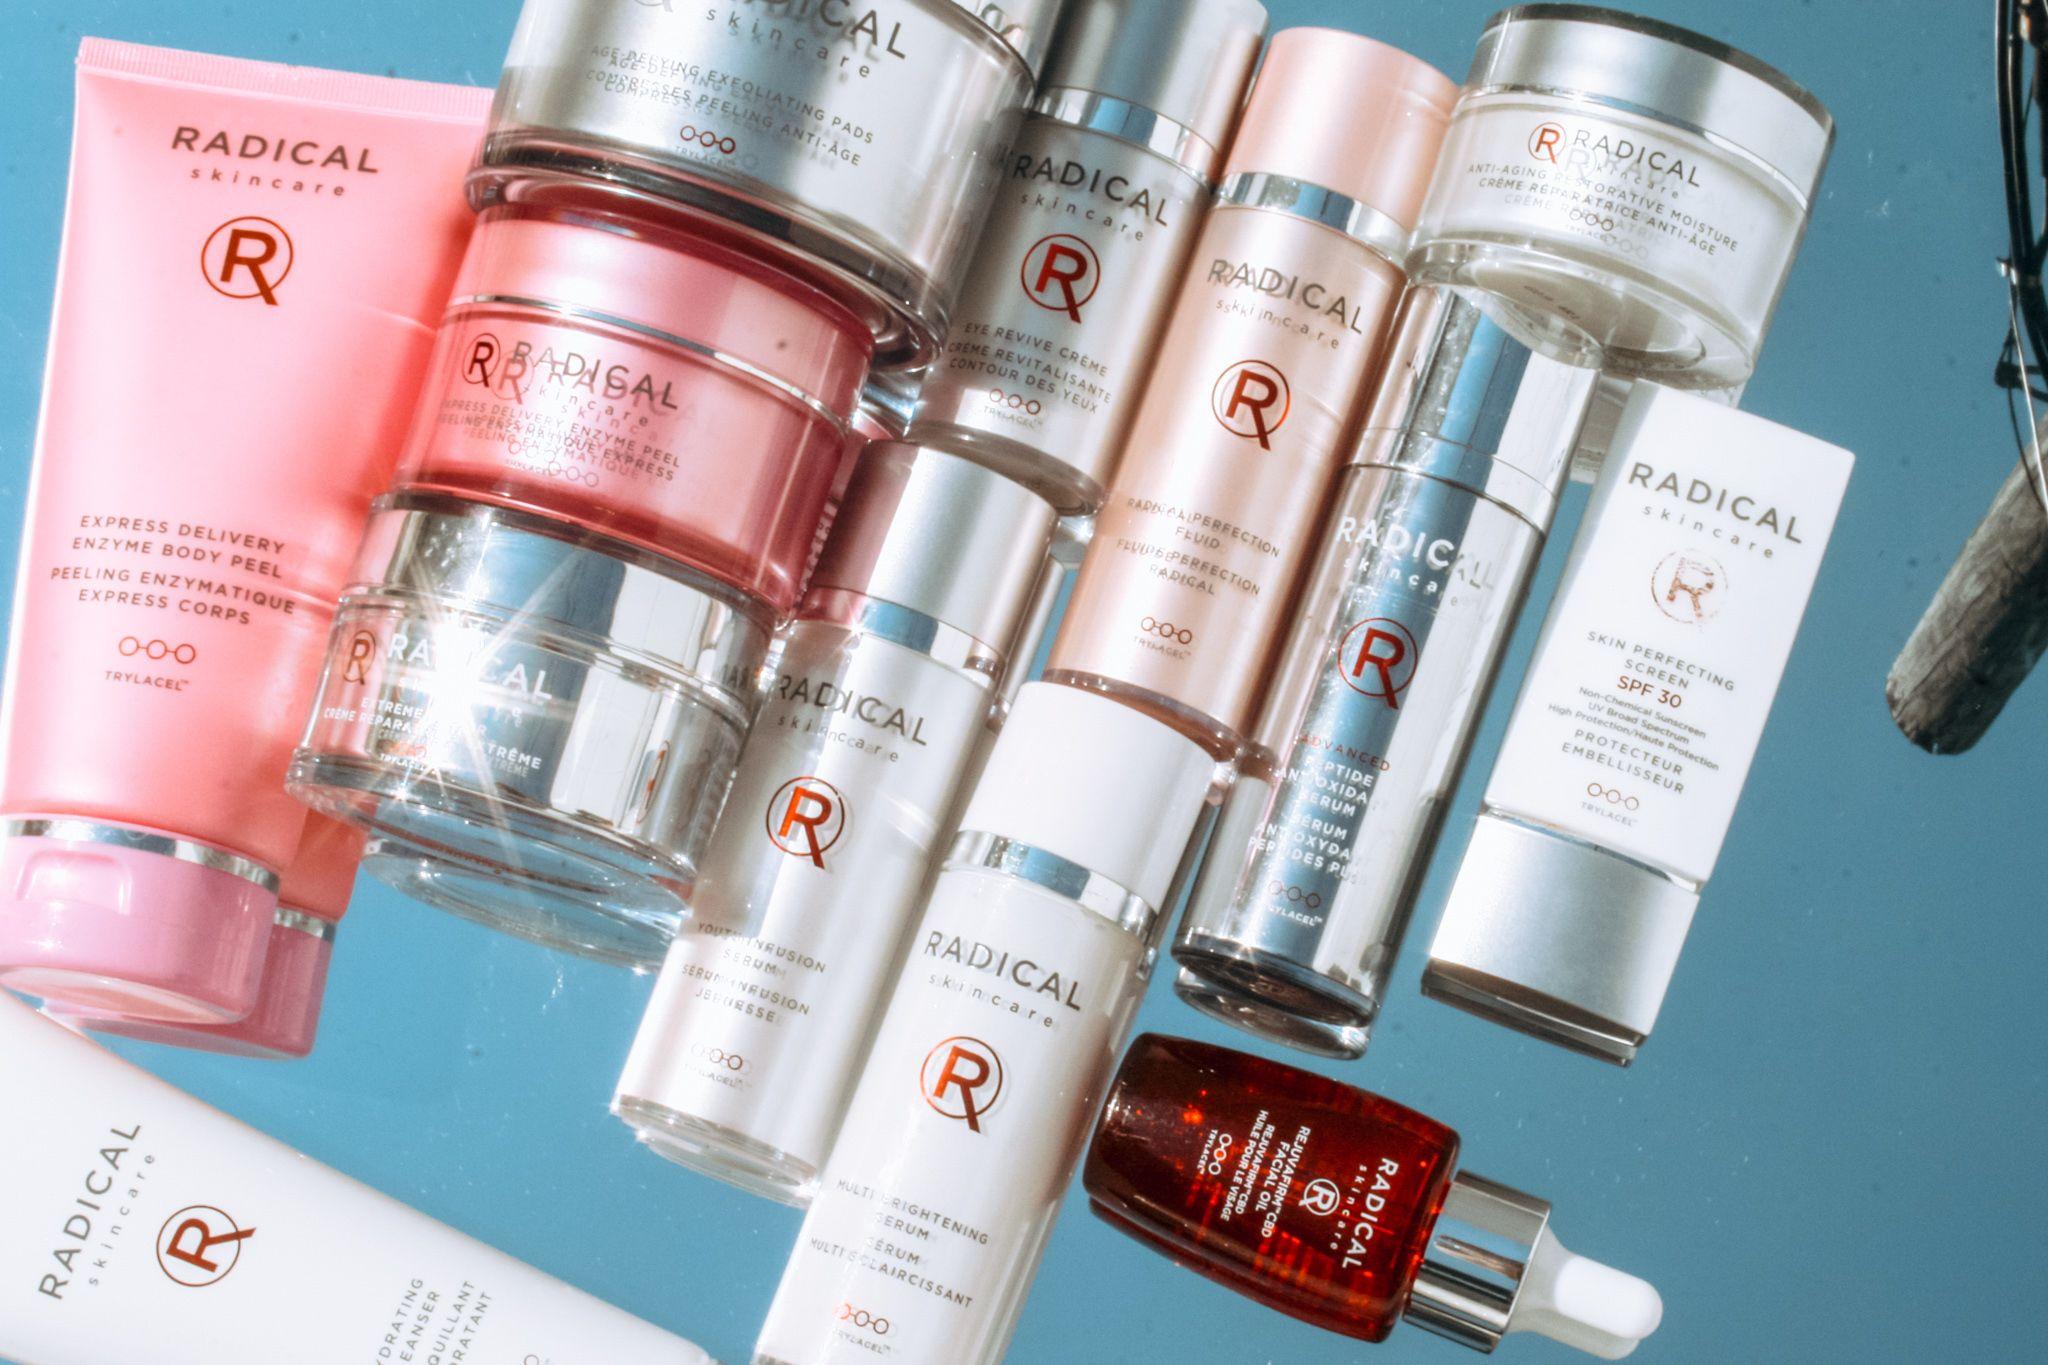 Trylacel Technology Radical Skincare Radical Skincare Skin Care Active Ingredient